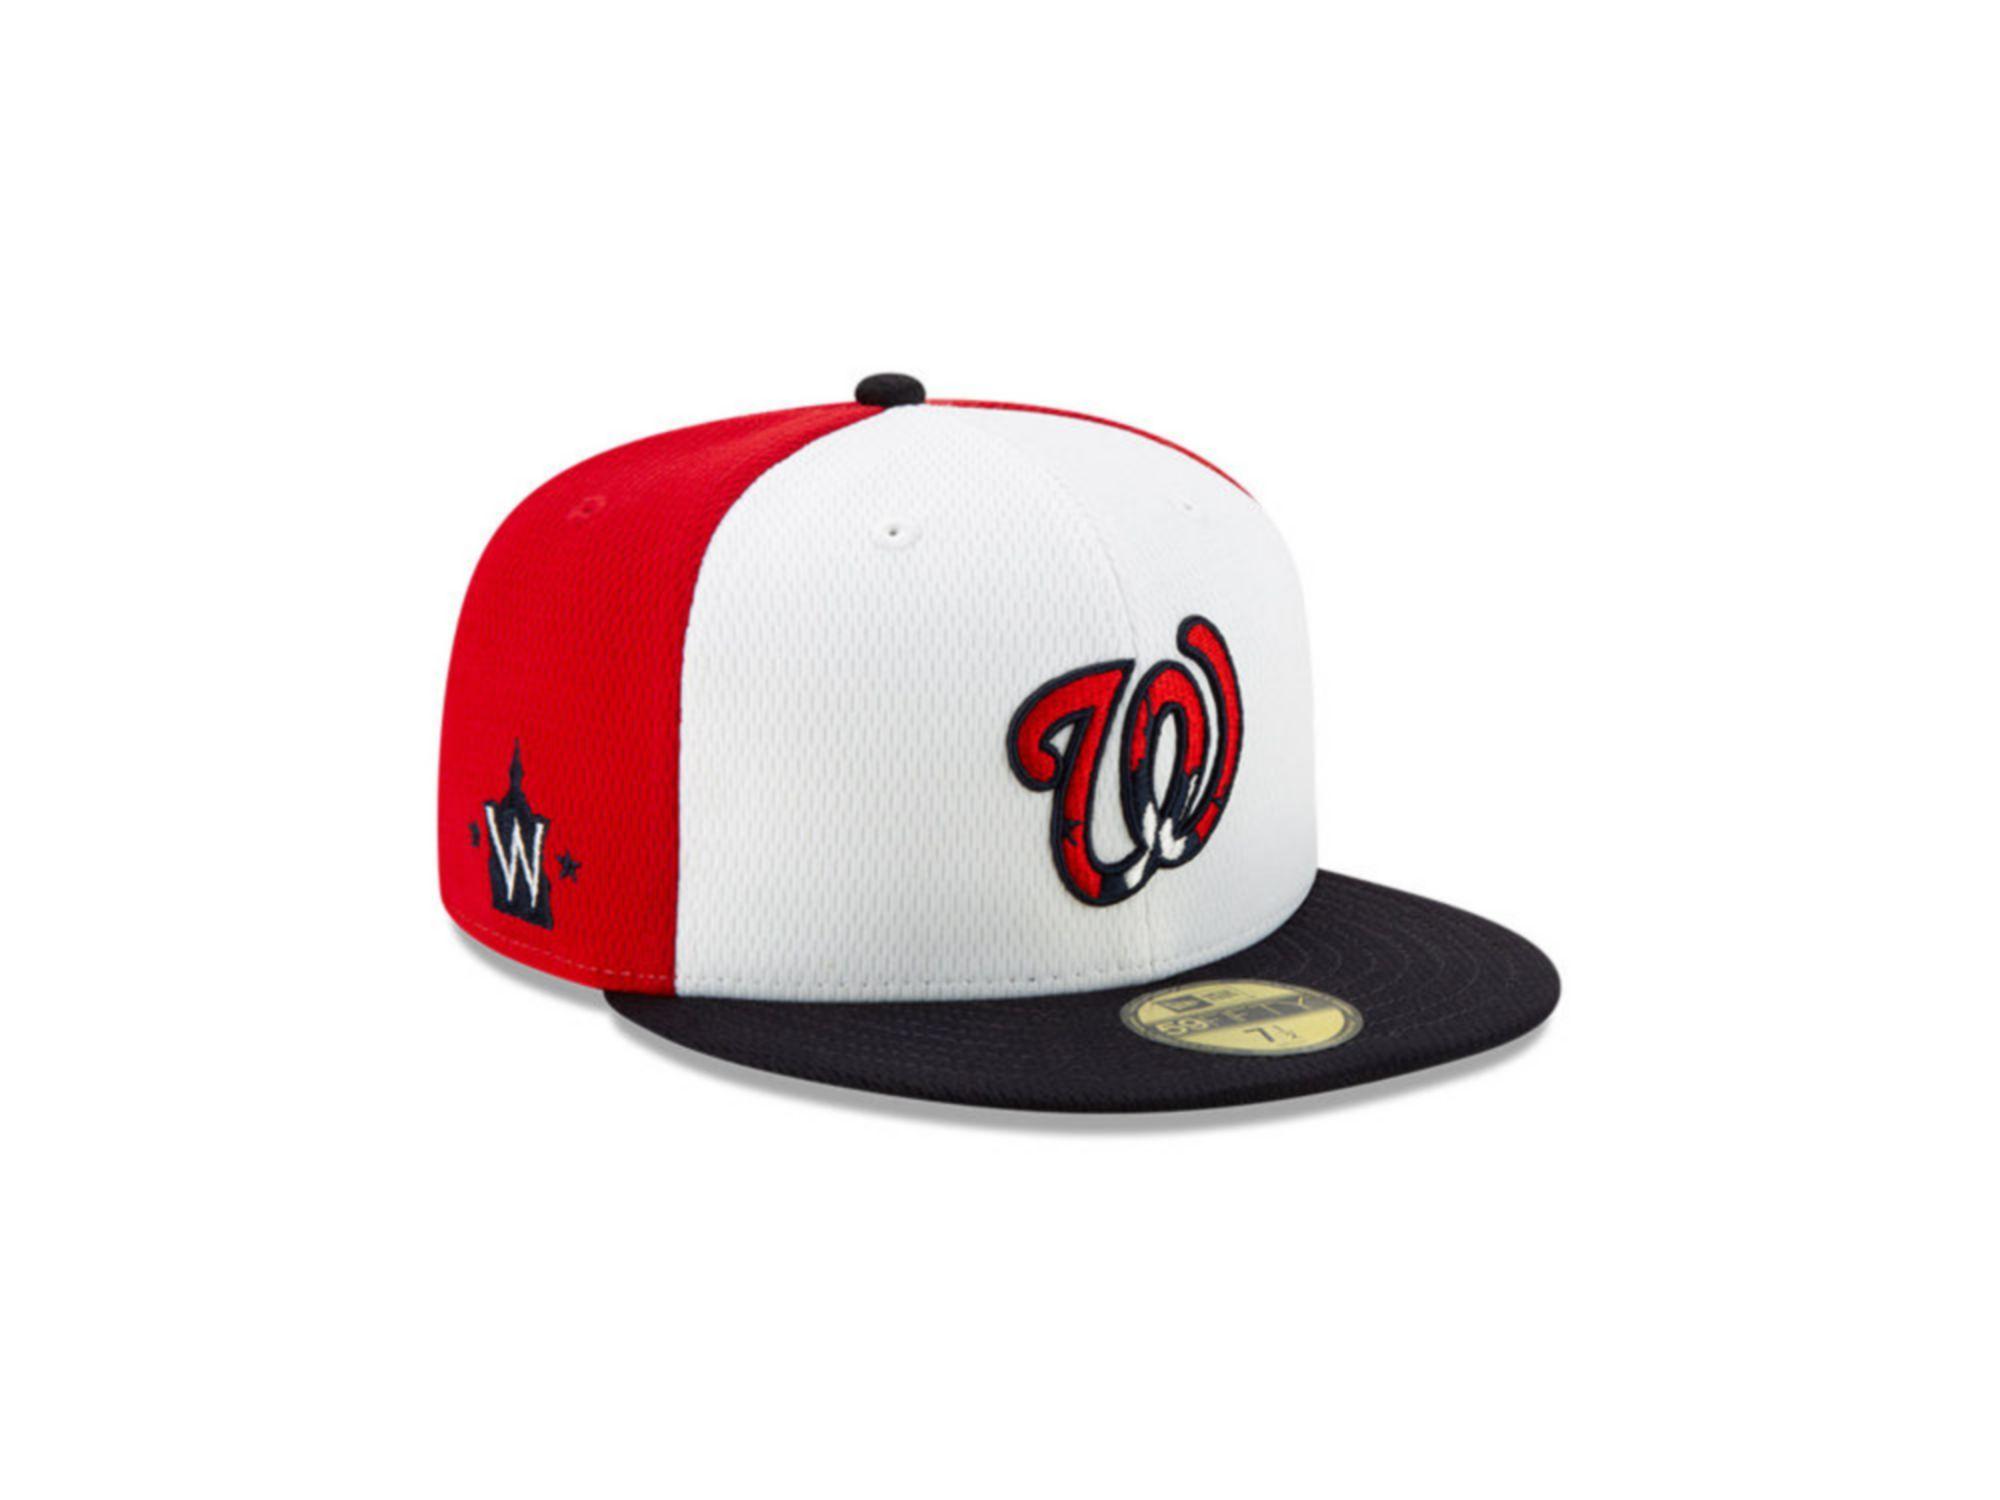 New Era Washington Nationals 2021 Spring Training 59FIFTY Cap & Reviews - MLB - Sports Fan Shop - Macy's